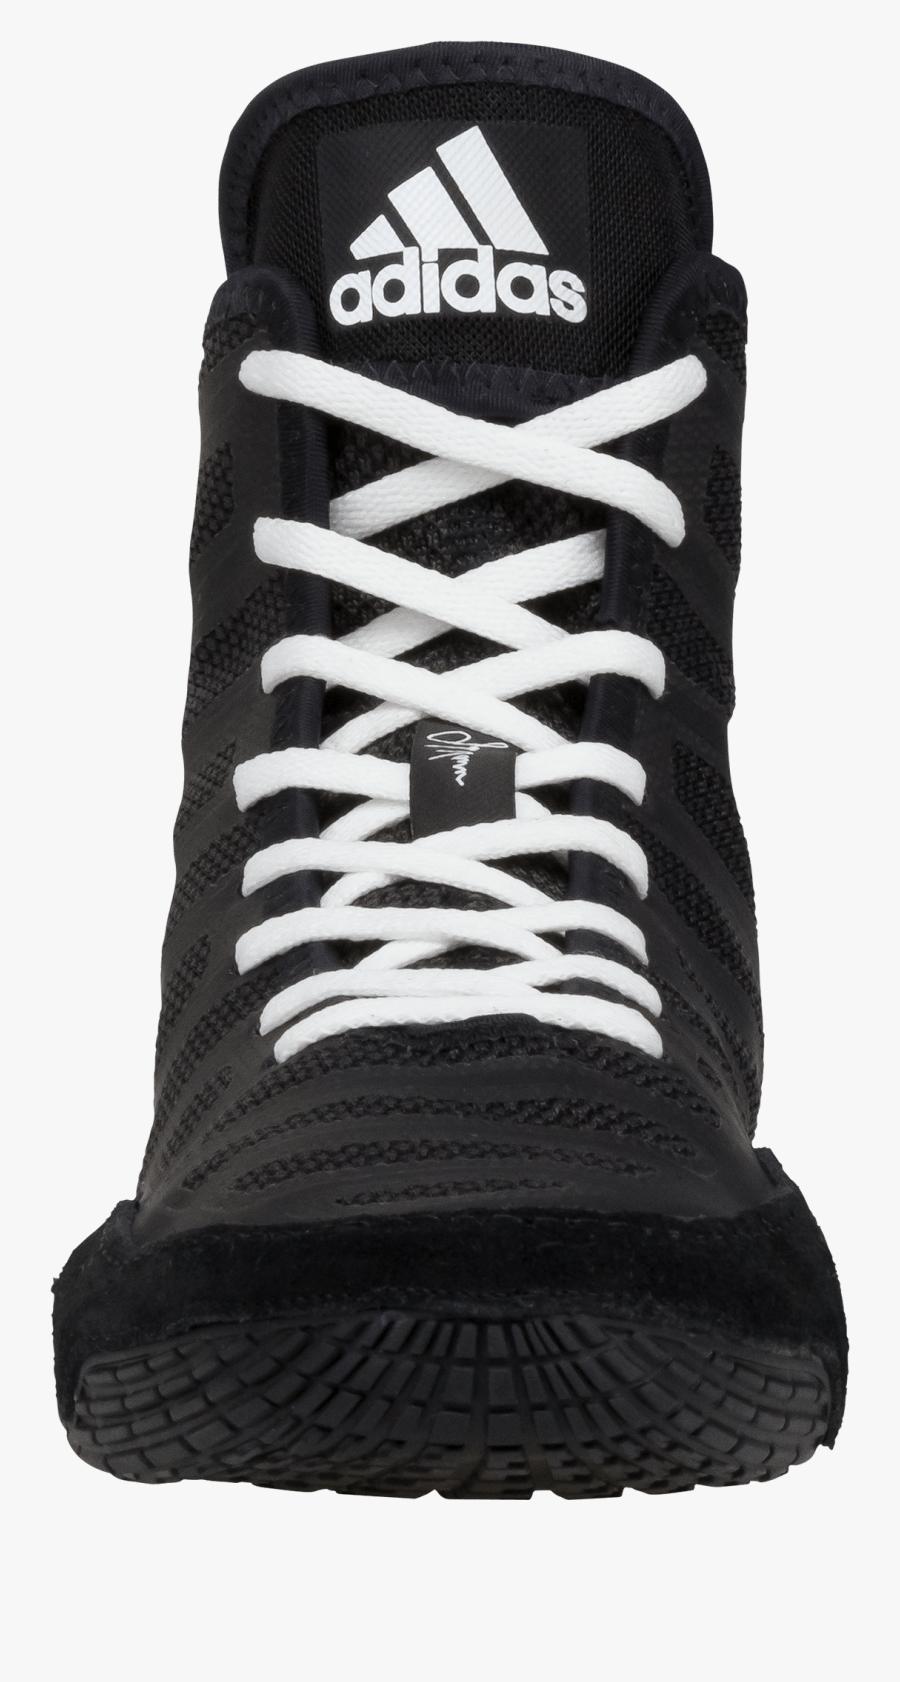 Evolucionar Adelante puramente  Adidas Shoes Clipart One Shoe - Adidas Shoes Front Png , Free Transparent  Clipart - ClipartKey